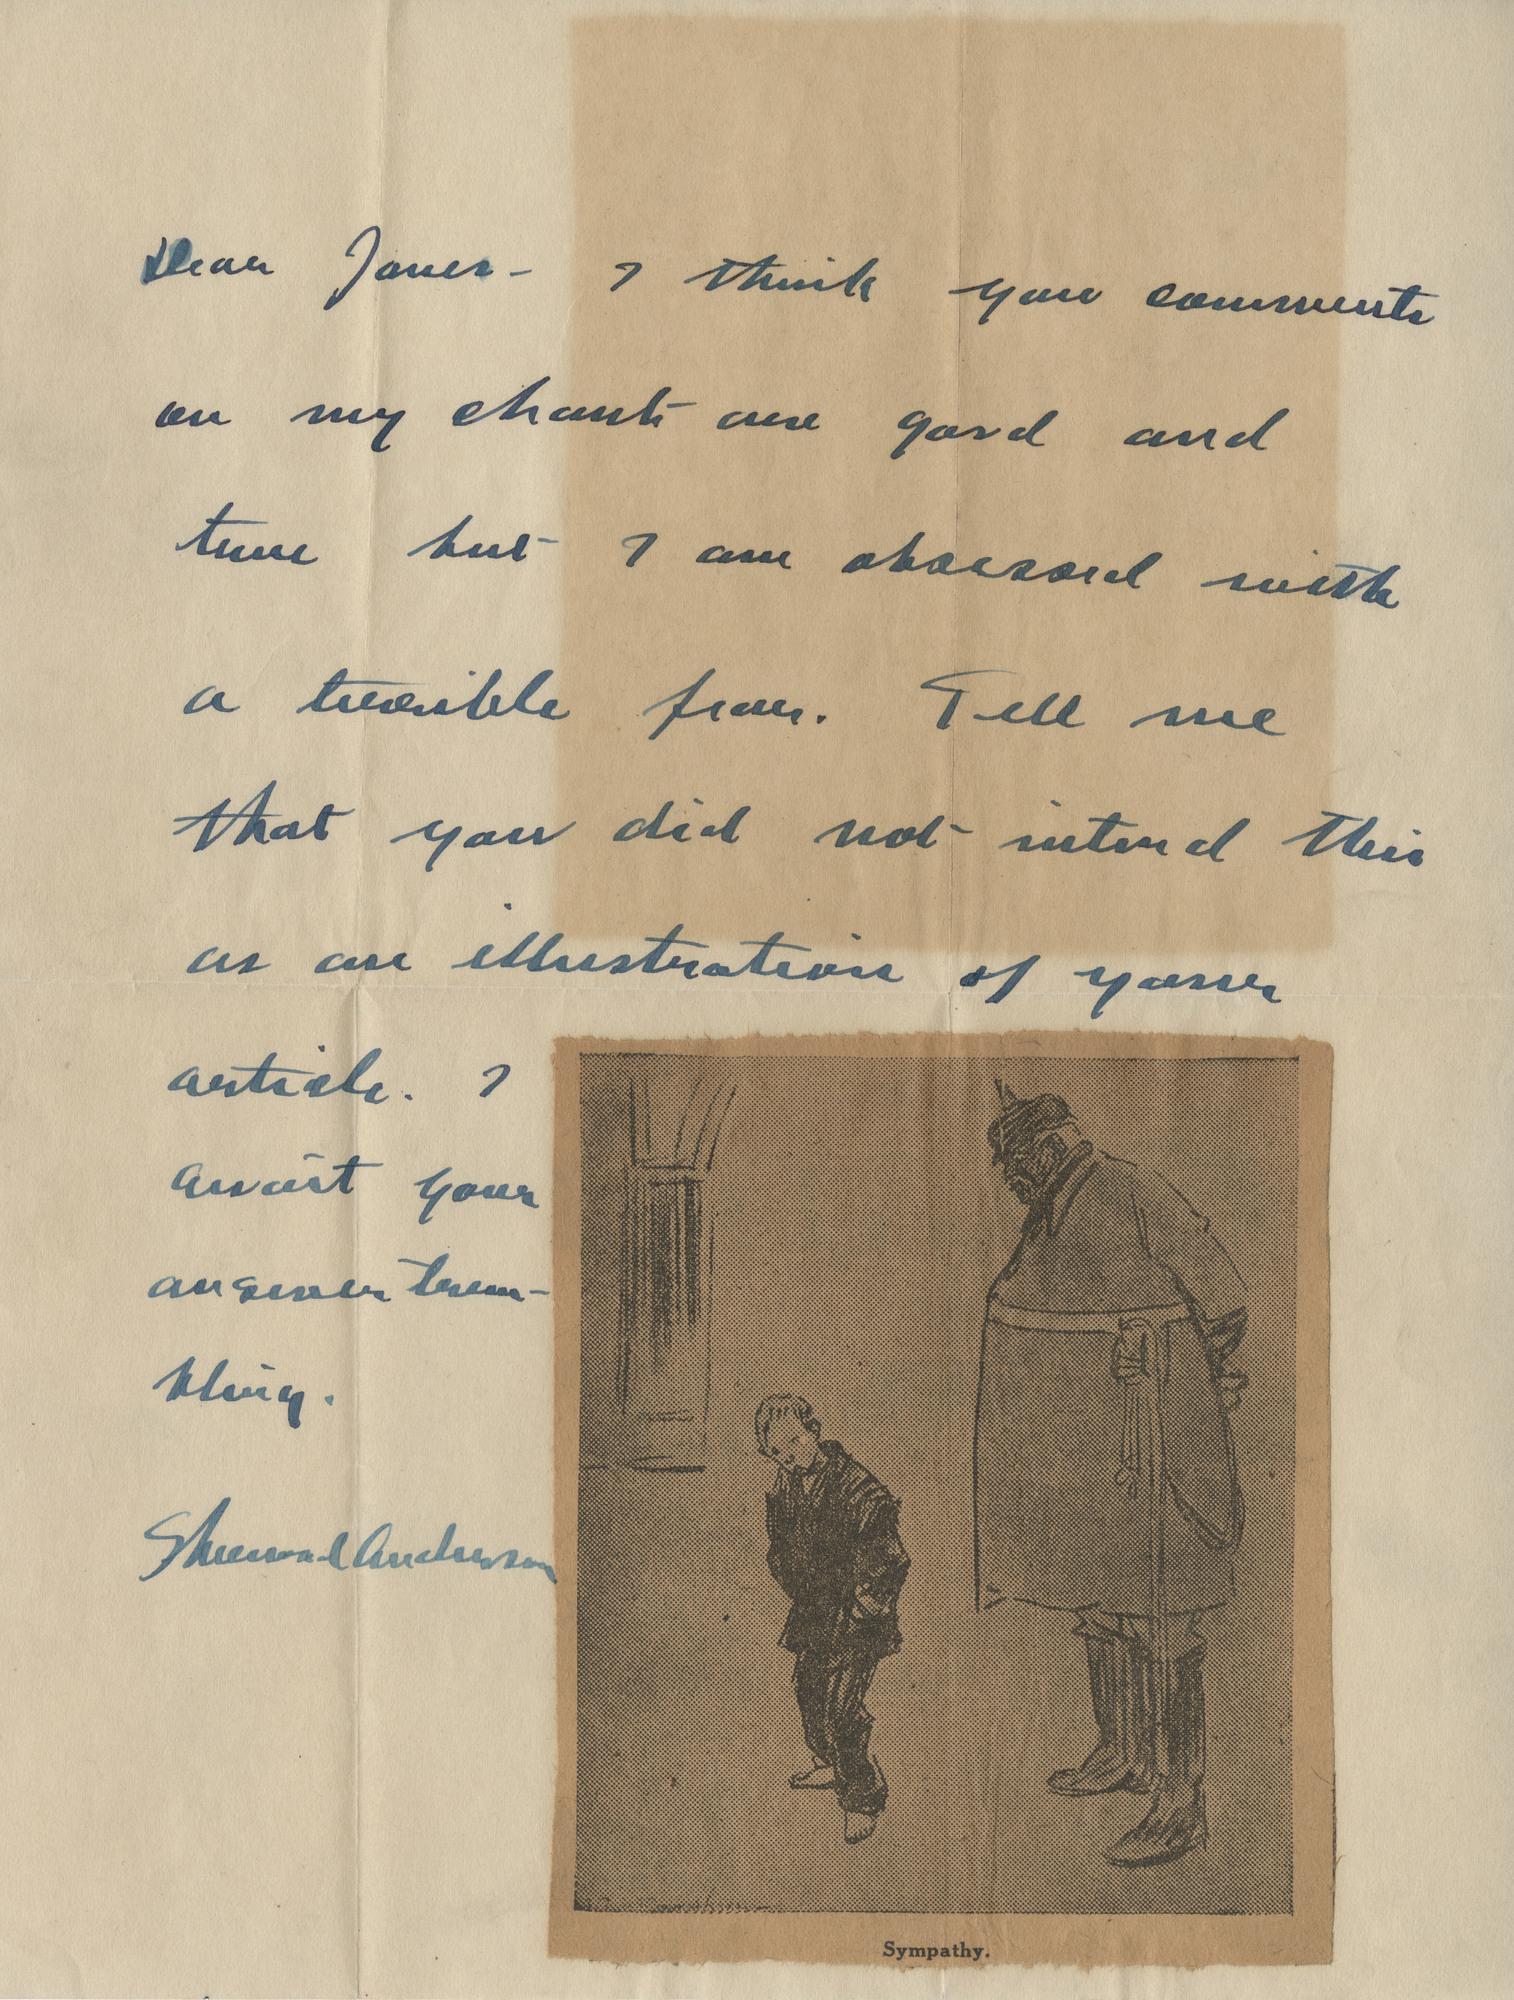 Ms2015-044_AndersonSherwood_Letter_1918_0426.jpg